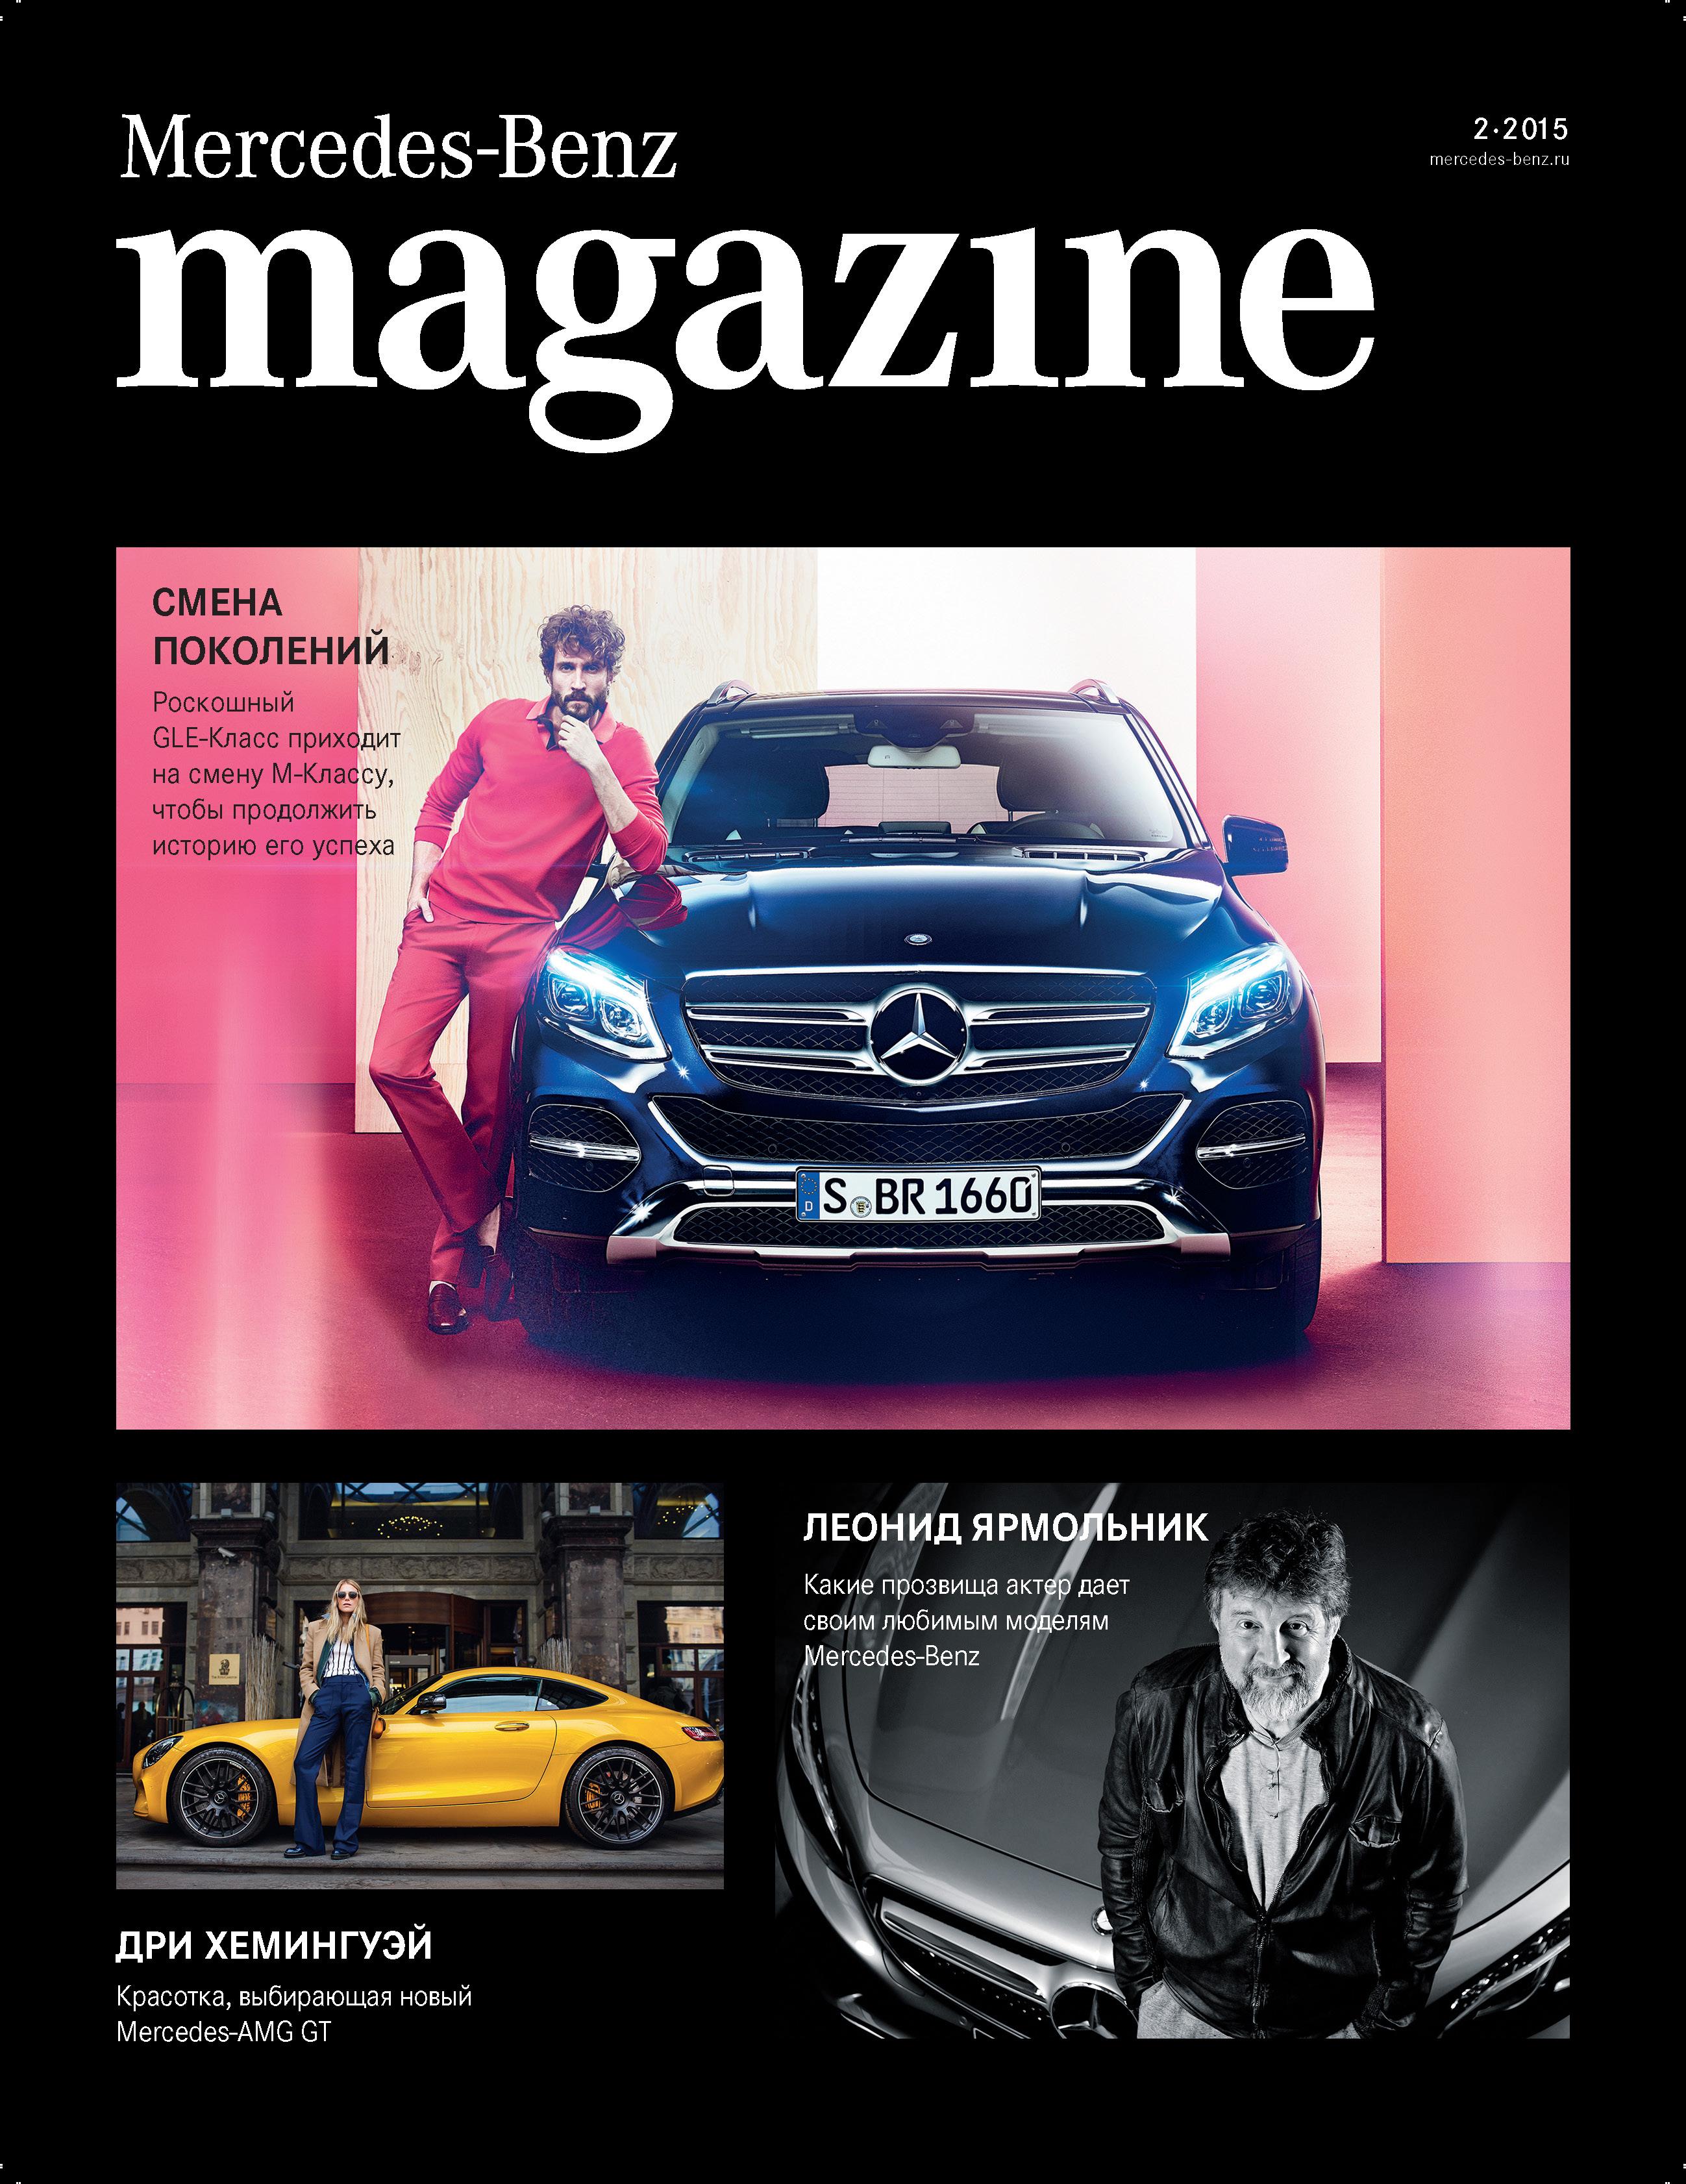 mercedes-benz magazine — mediacrat | publishing